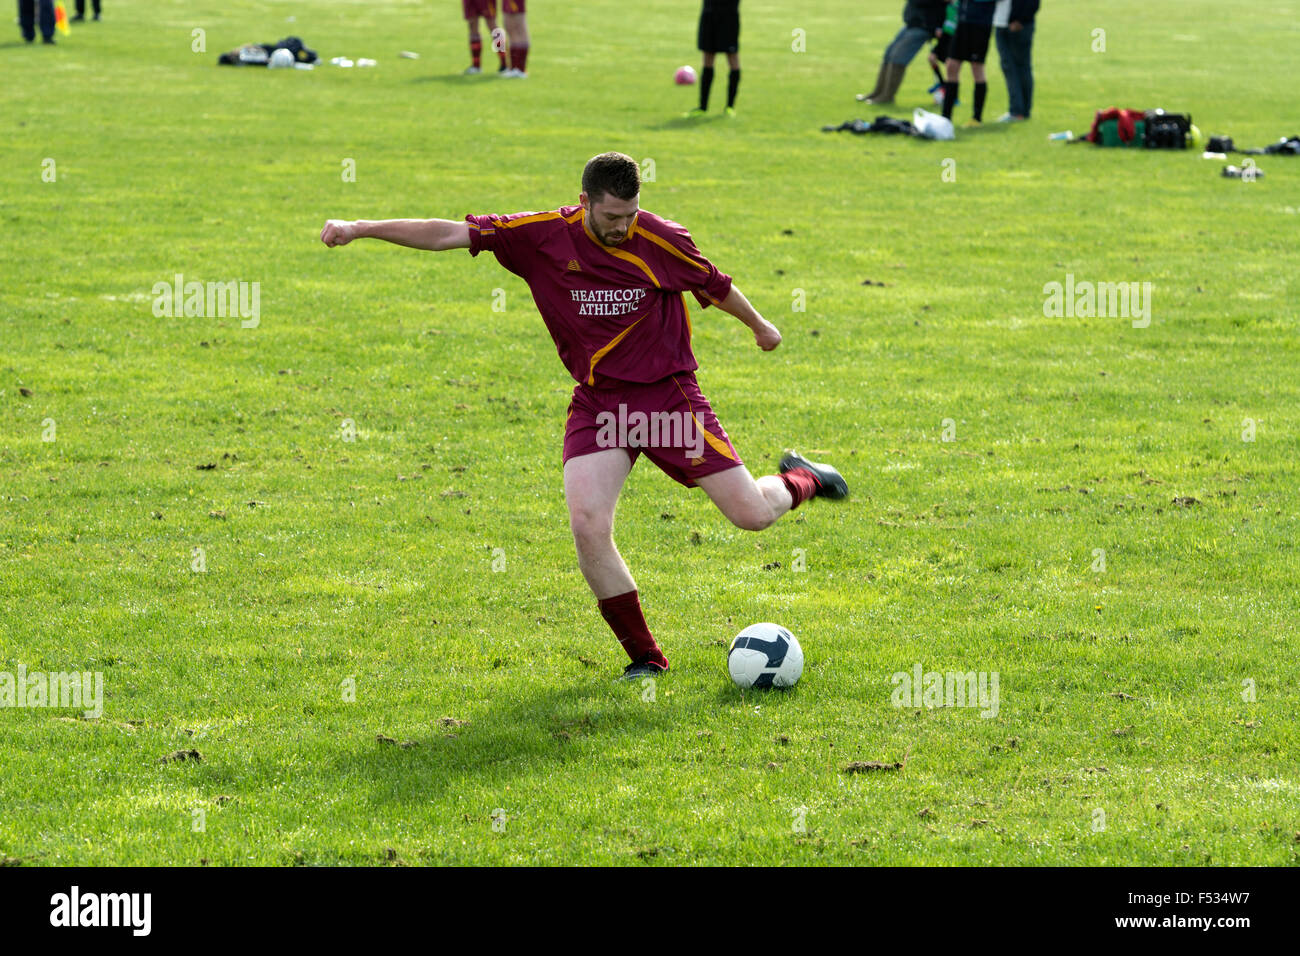 Sunday League football - Stock Image